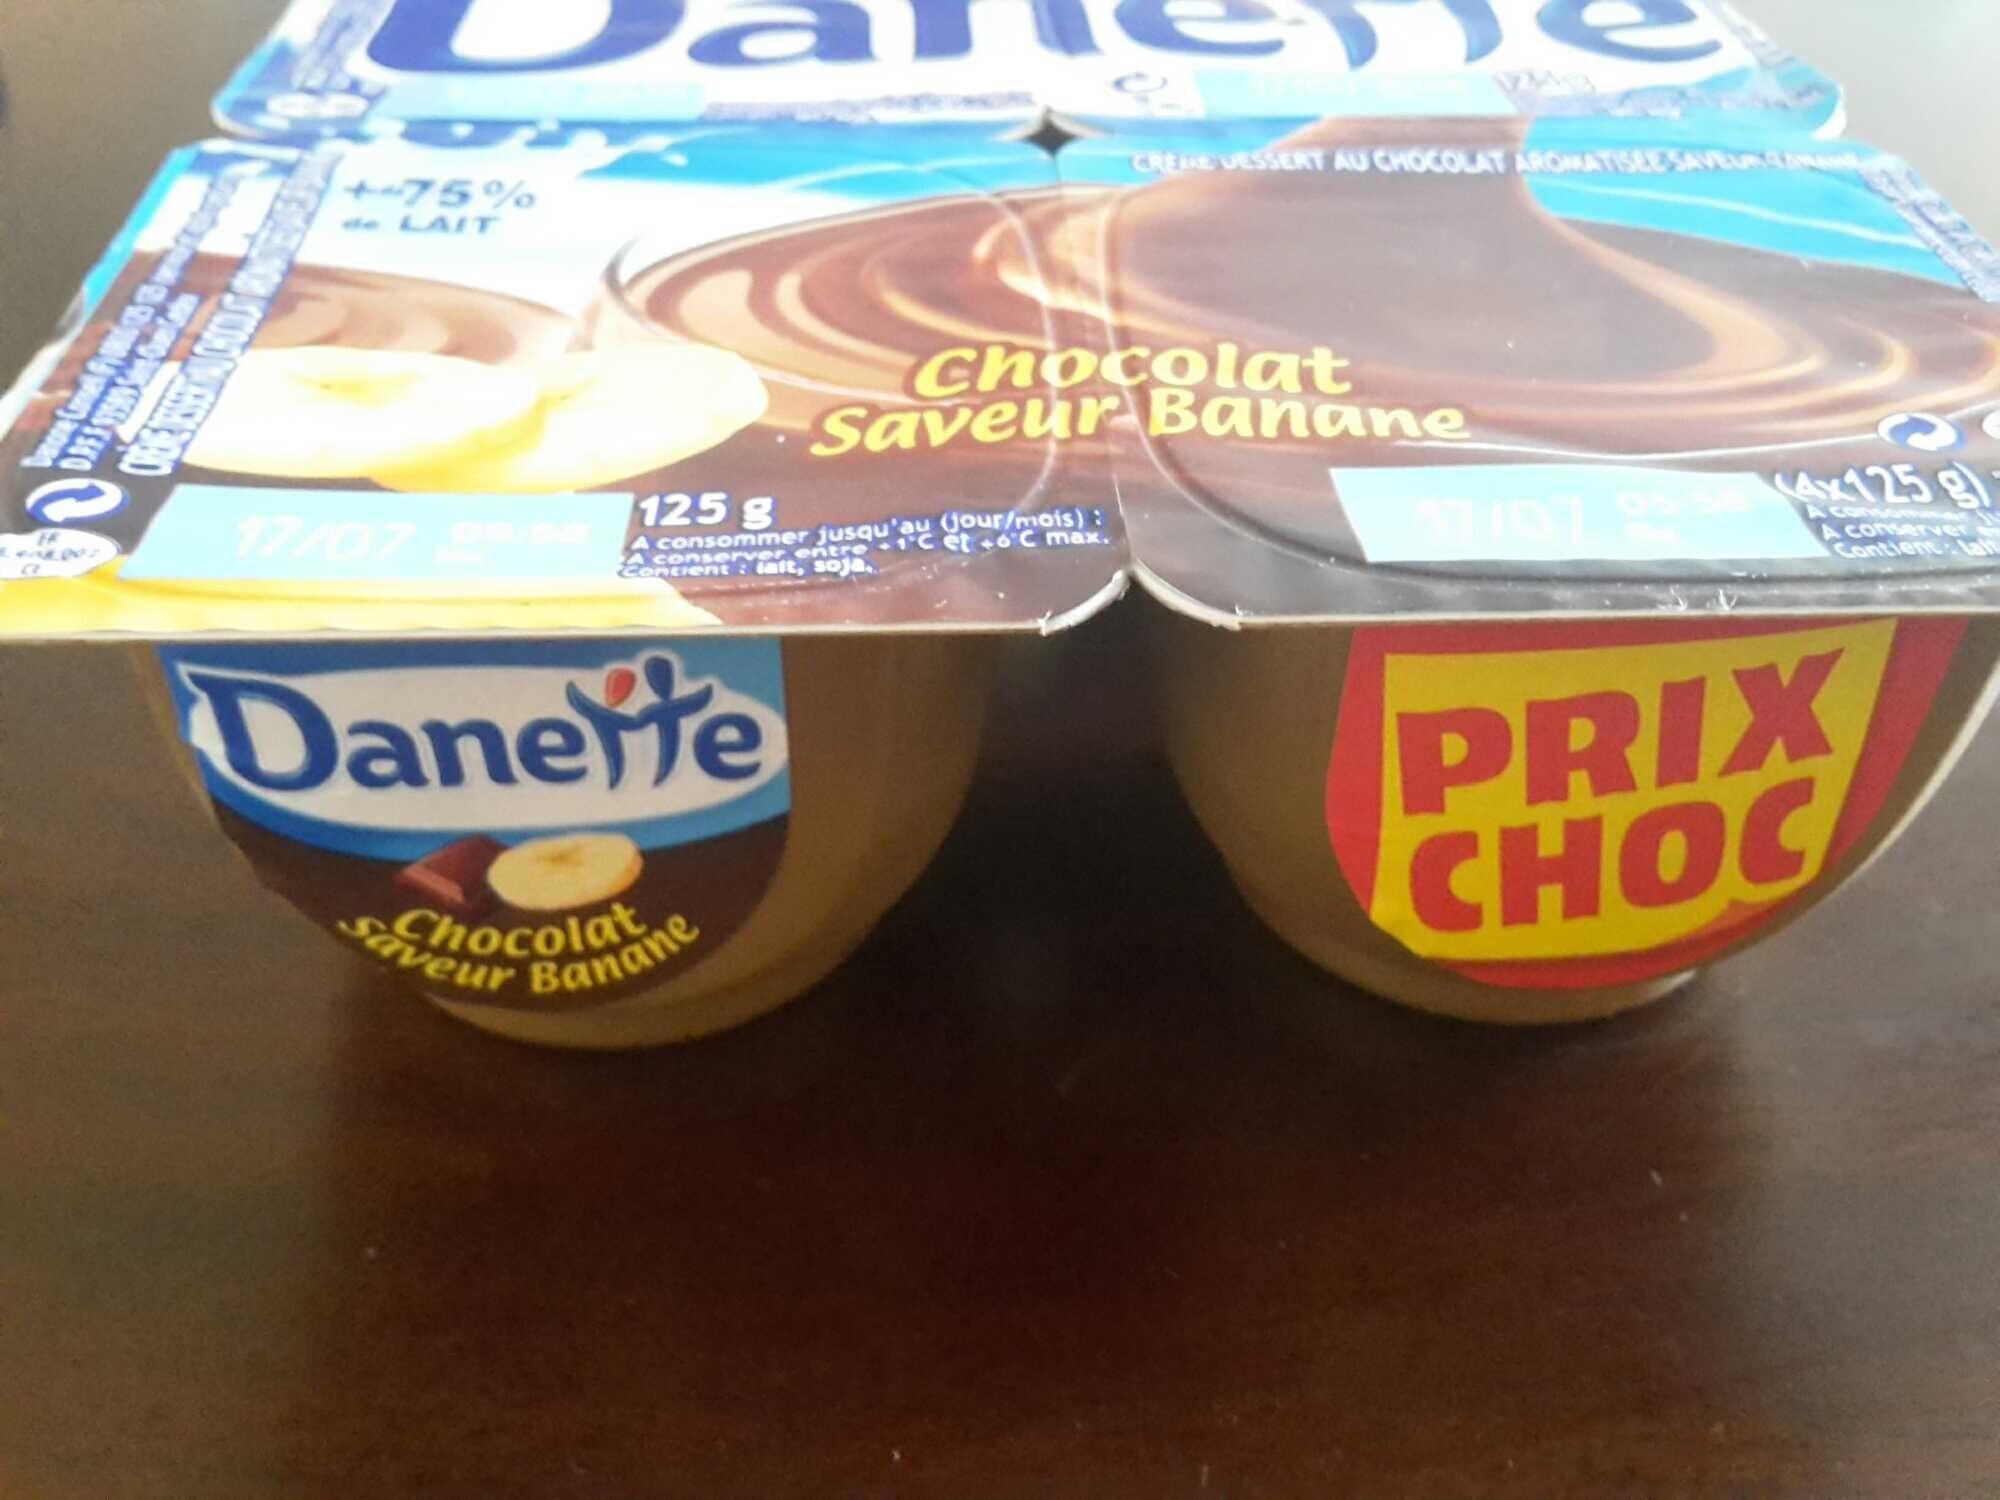 Danette Chocolat saveur Banane (Prix choc) - Produit - fr